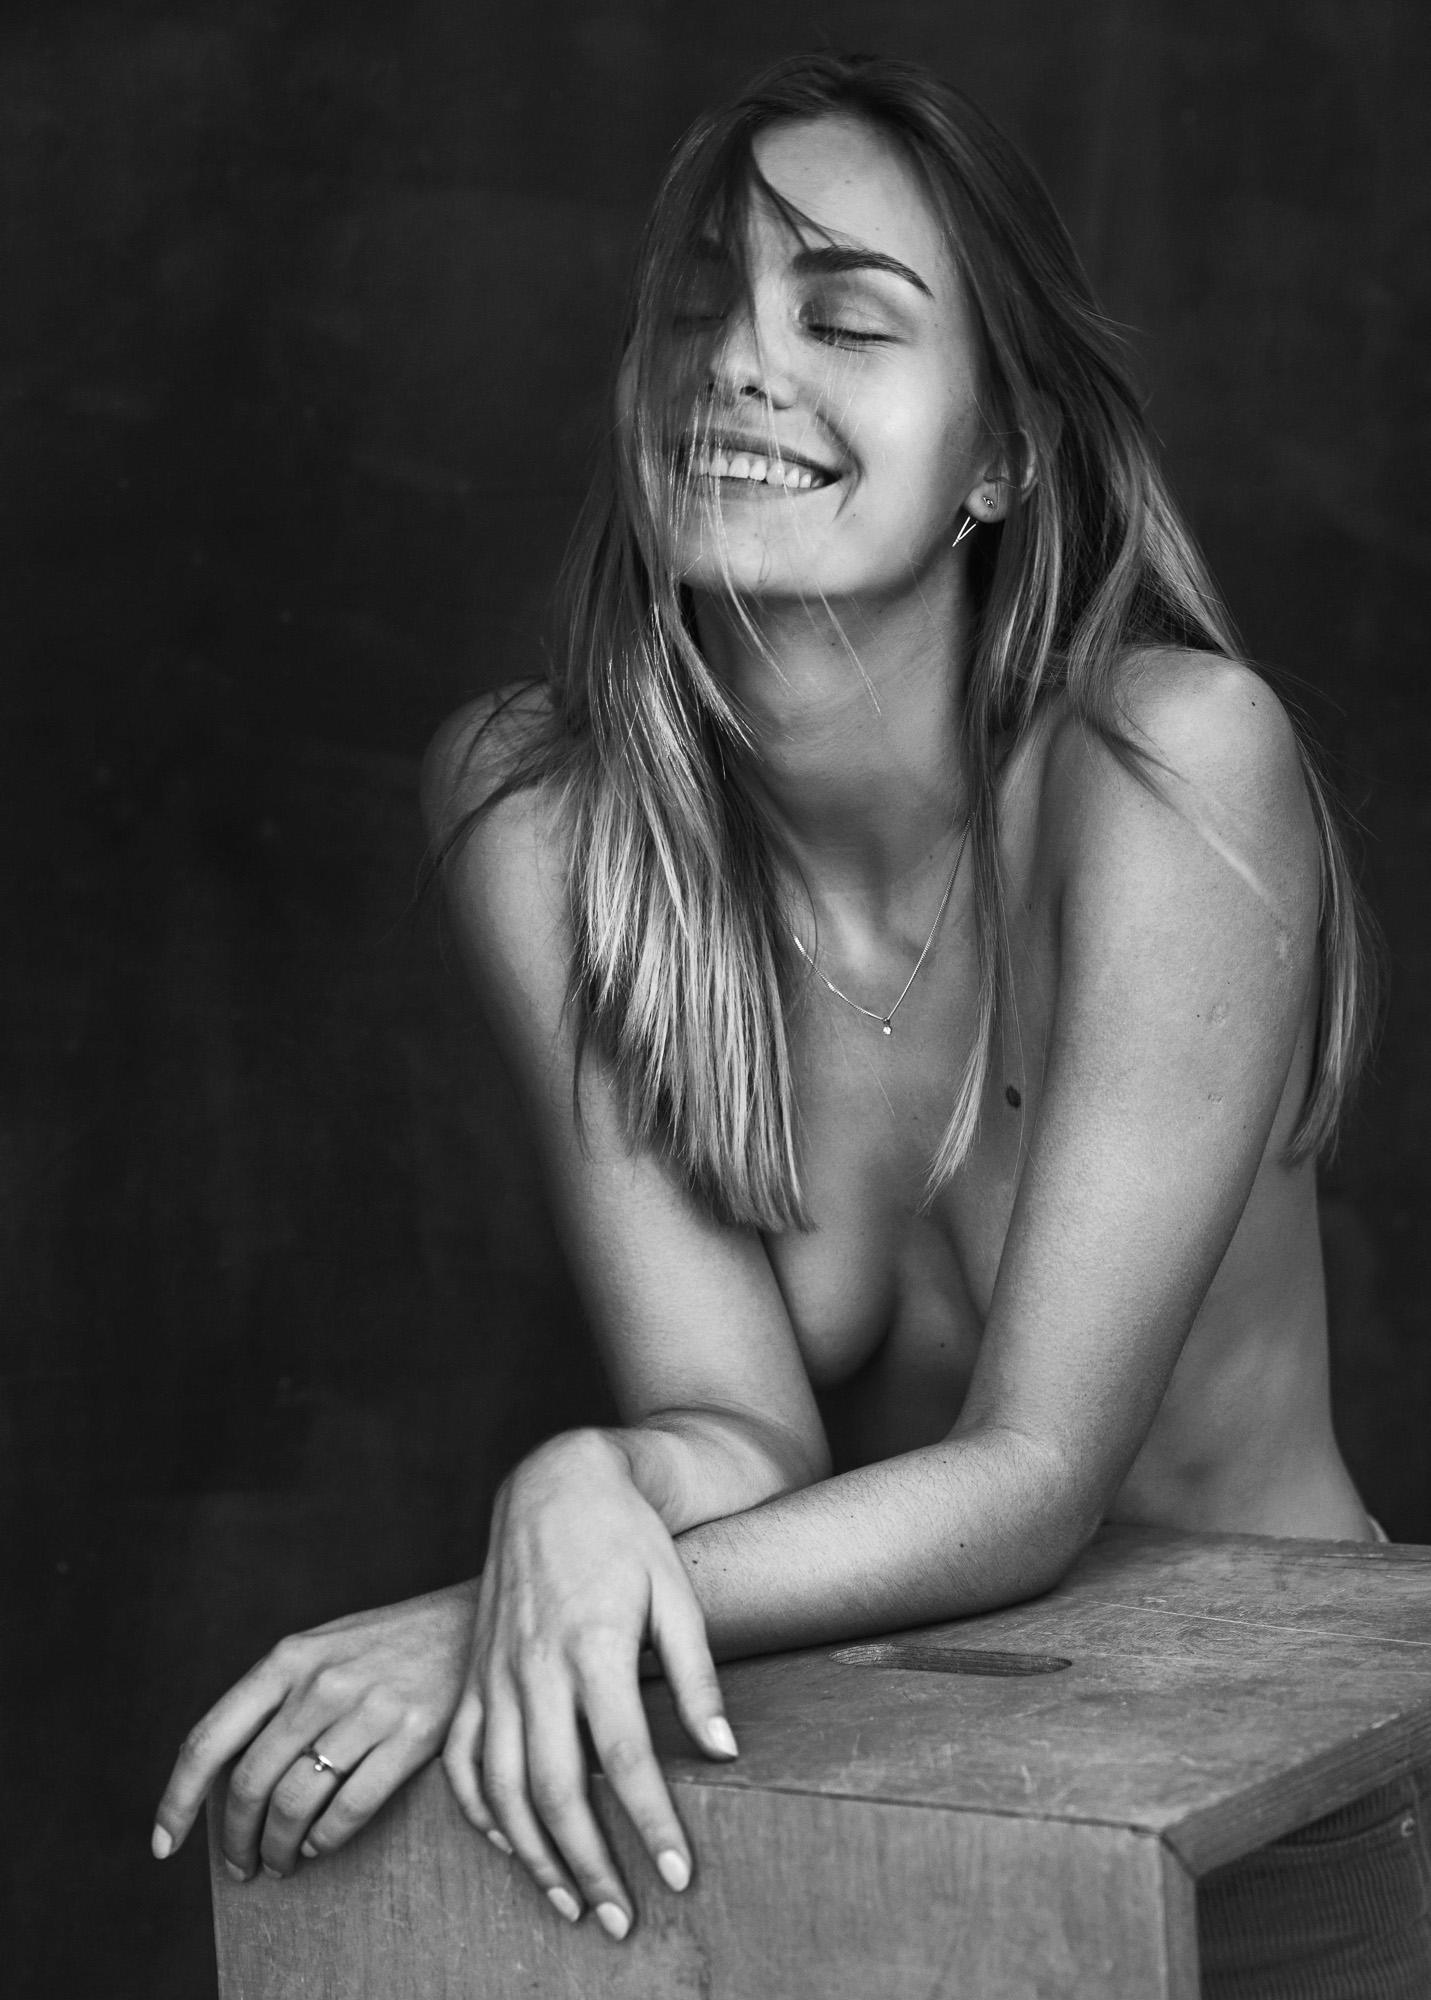 Julija Steponavičiūtė - professional model and food blogger.